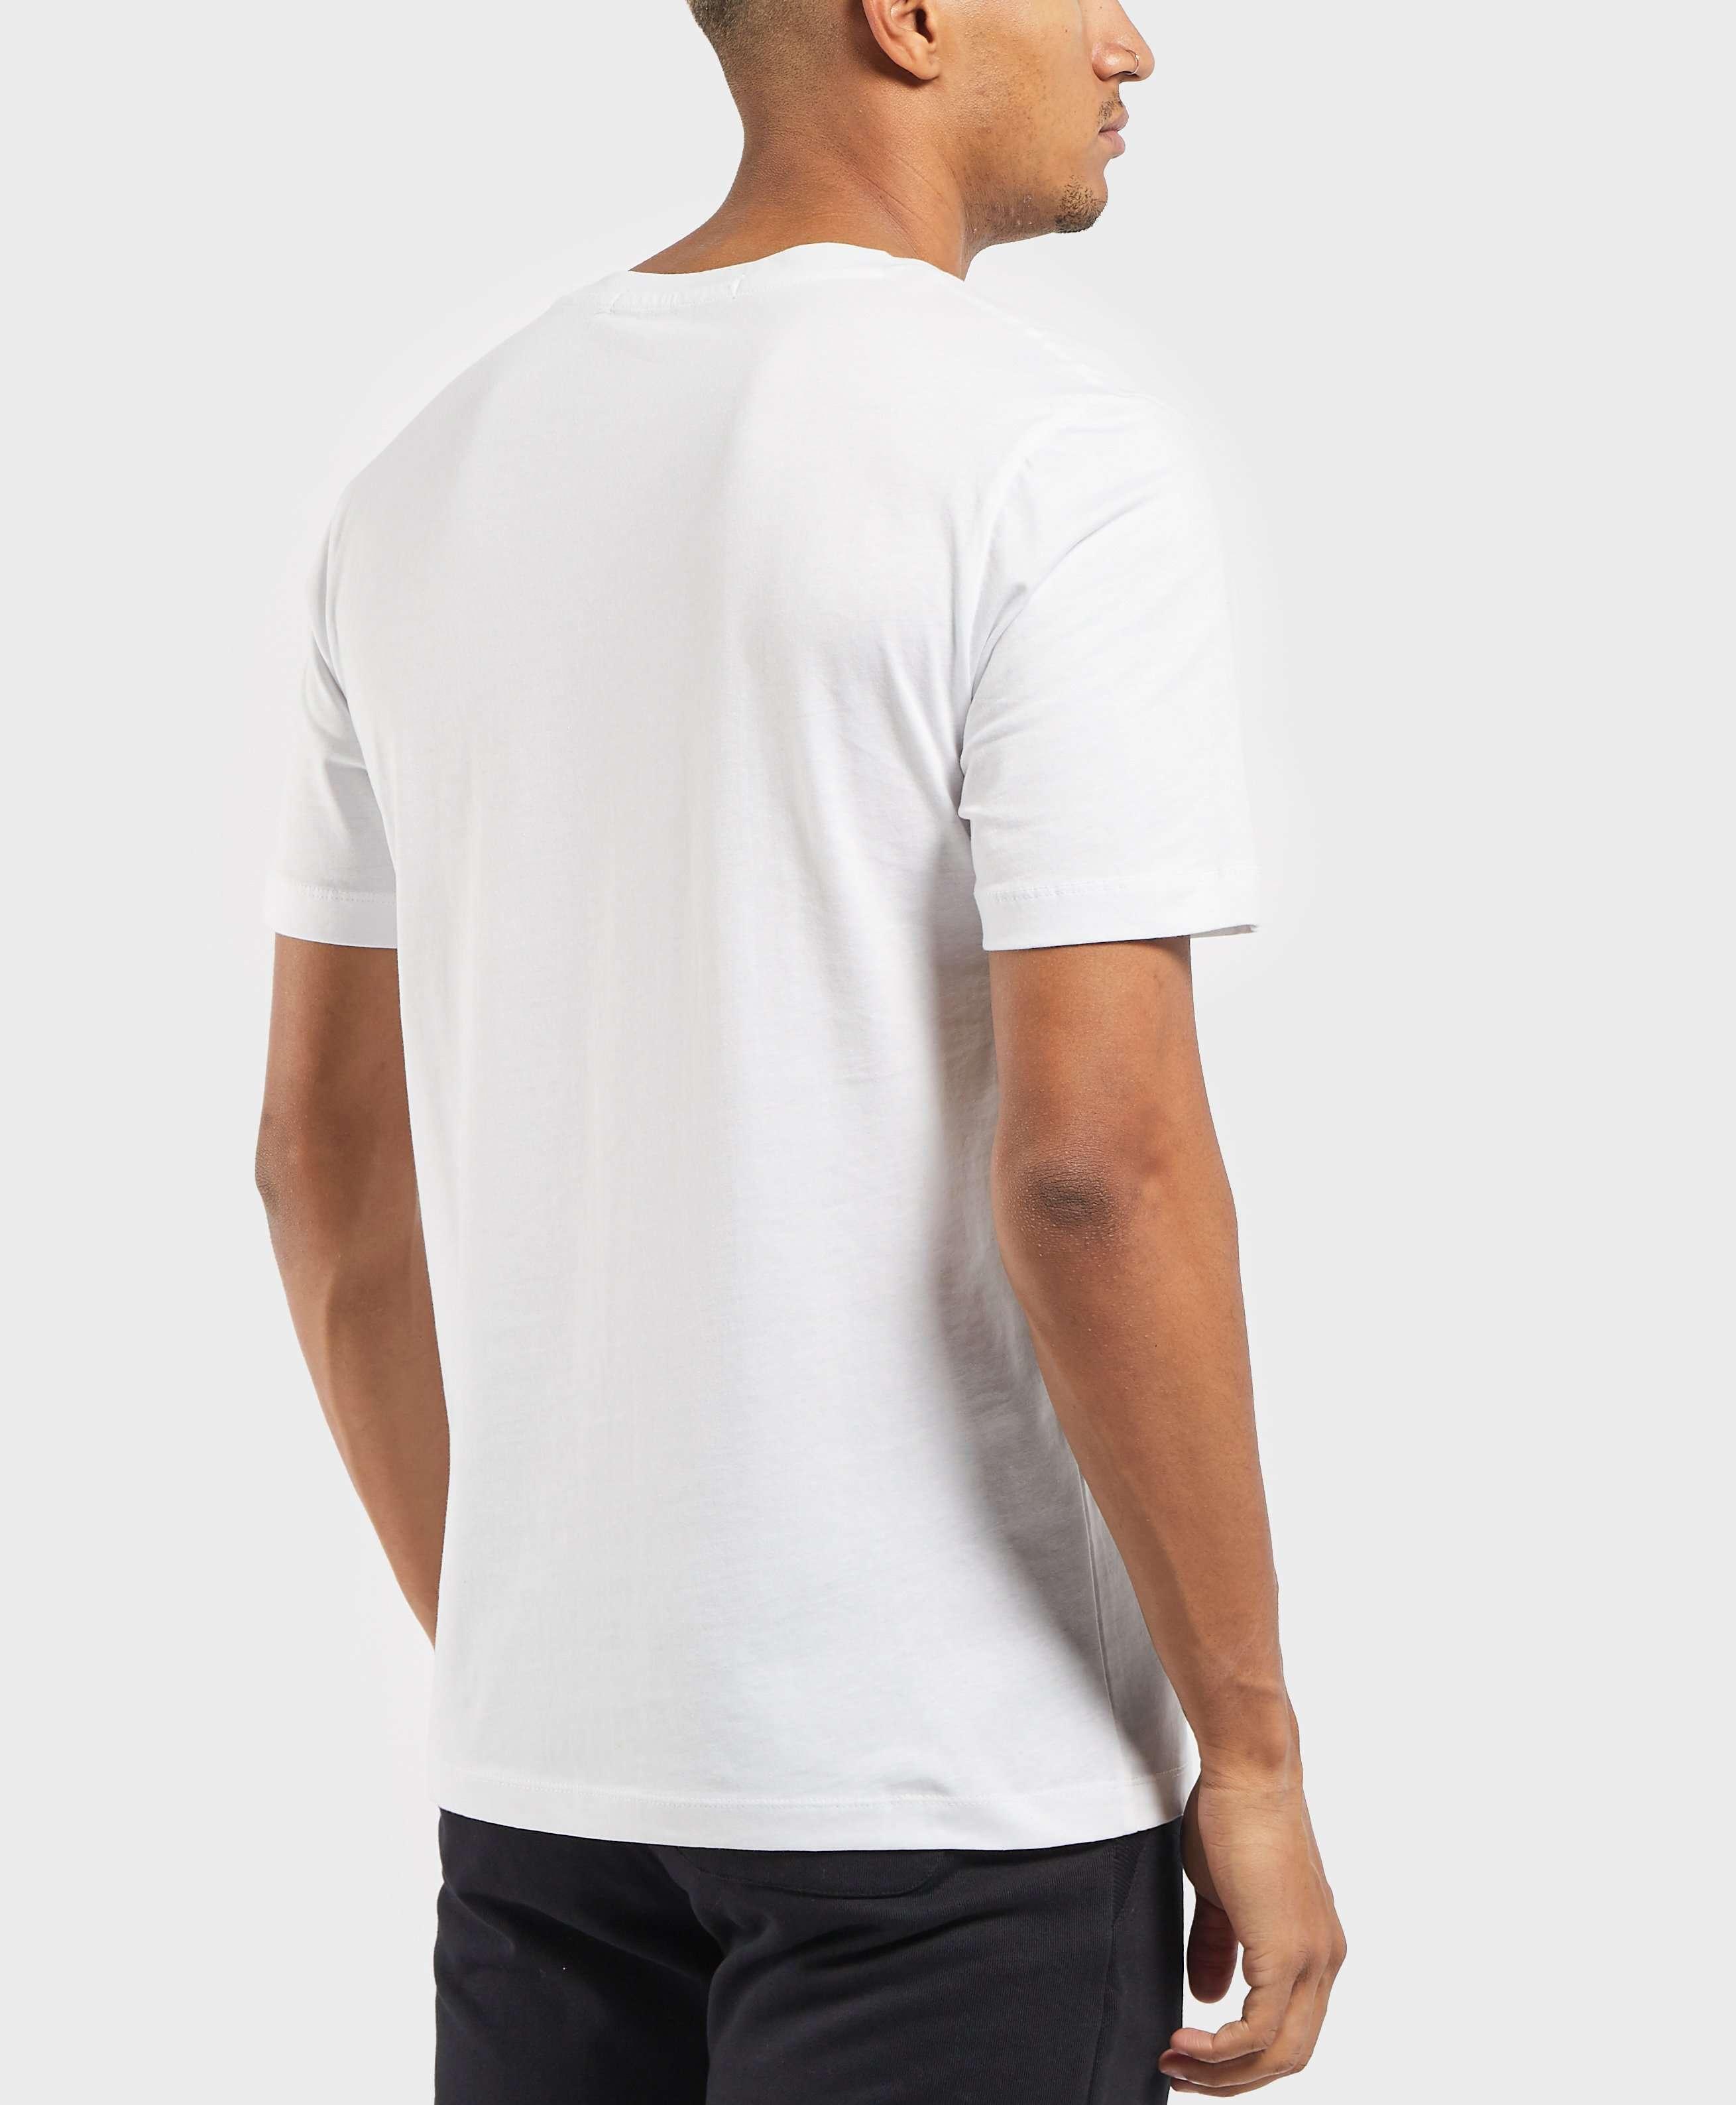 Calvin Klein Institutional Box Short Sleeve T-Shirt